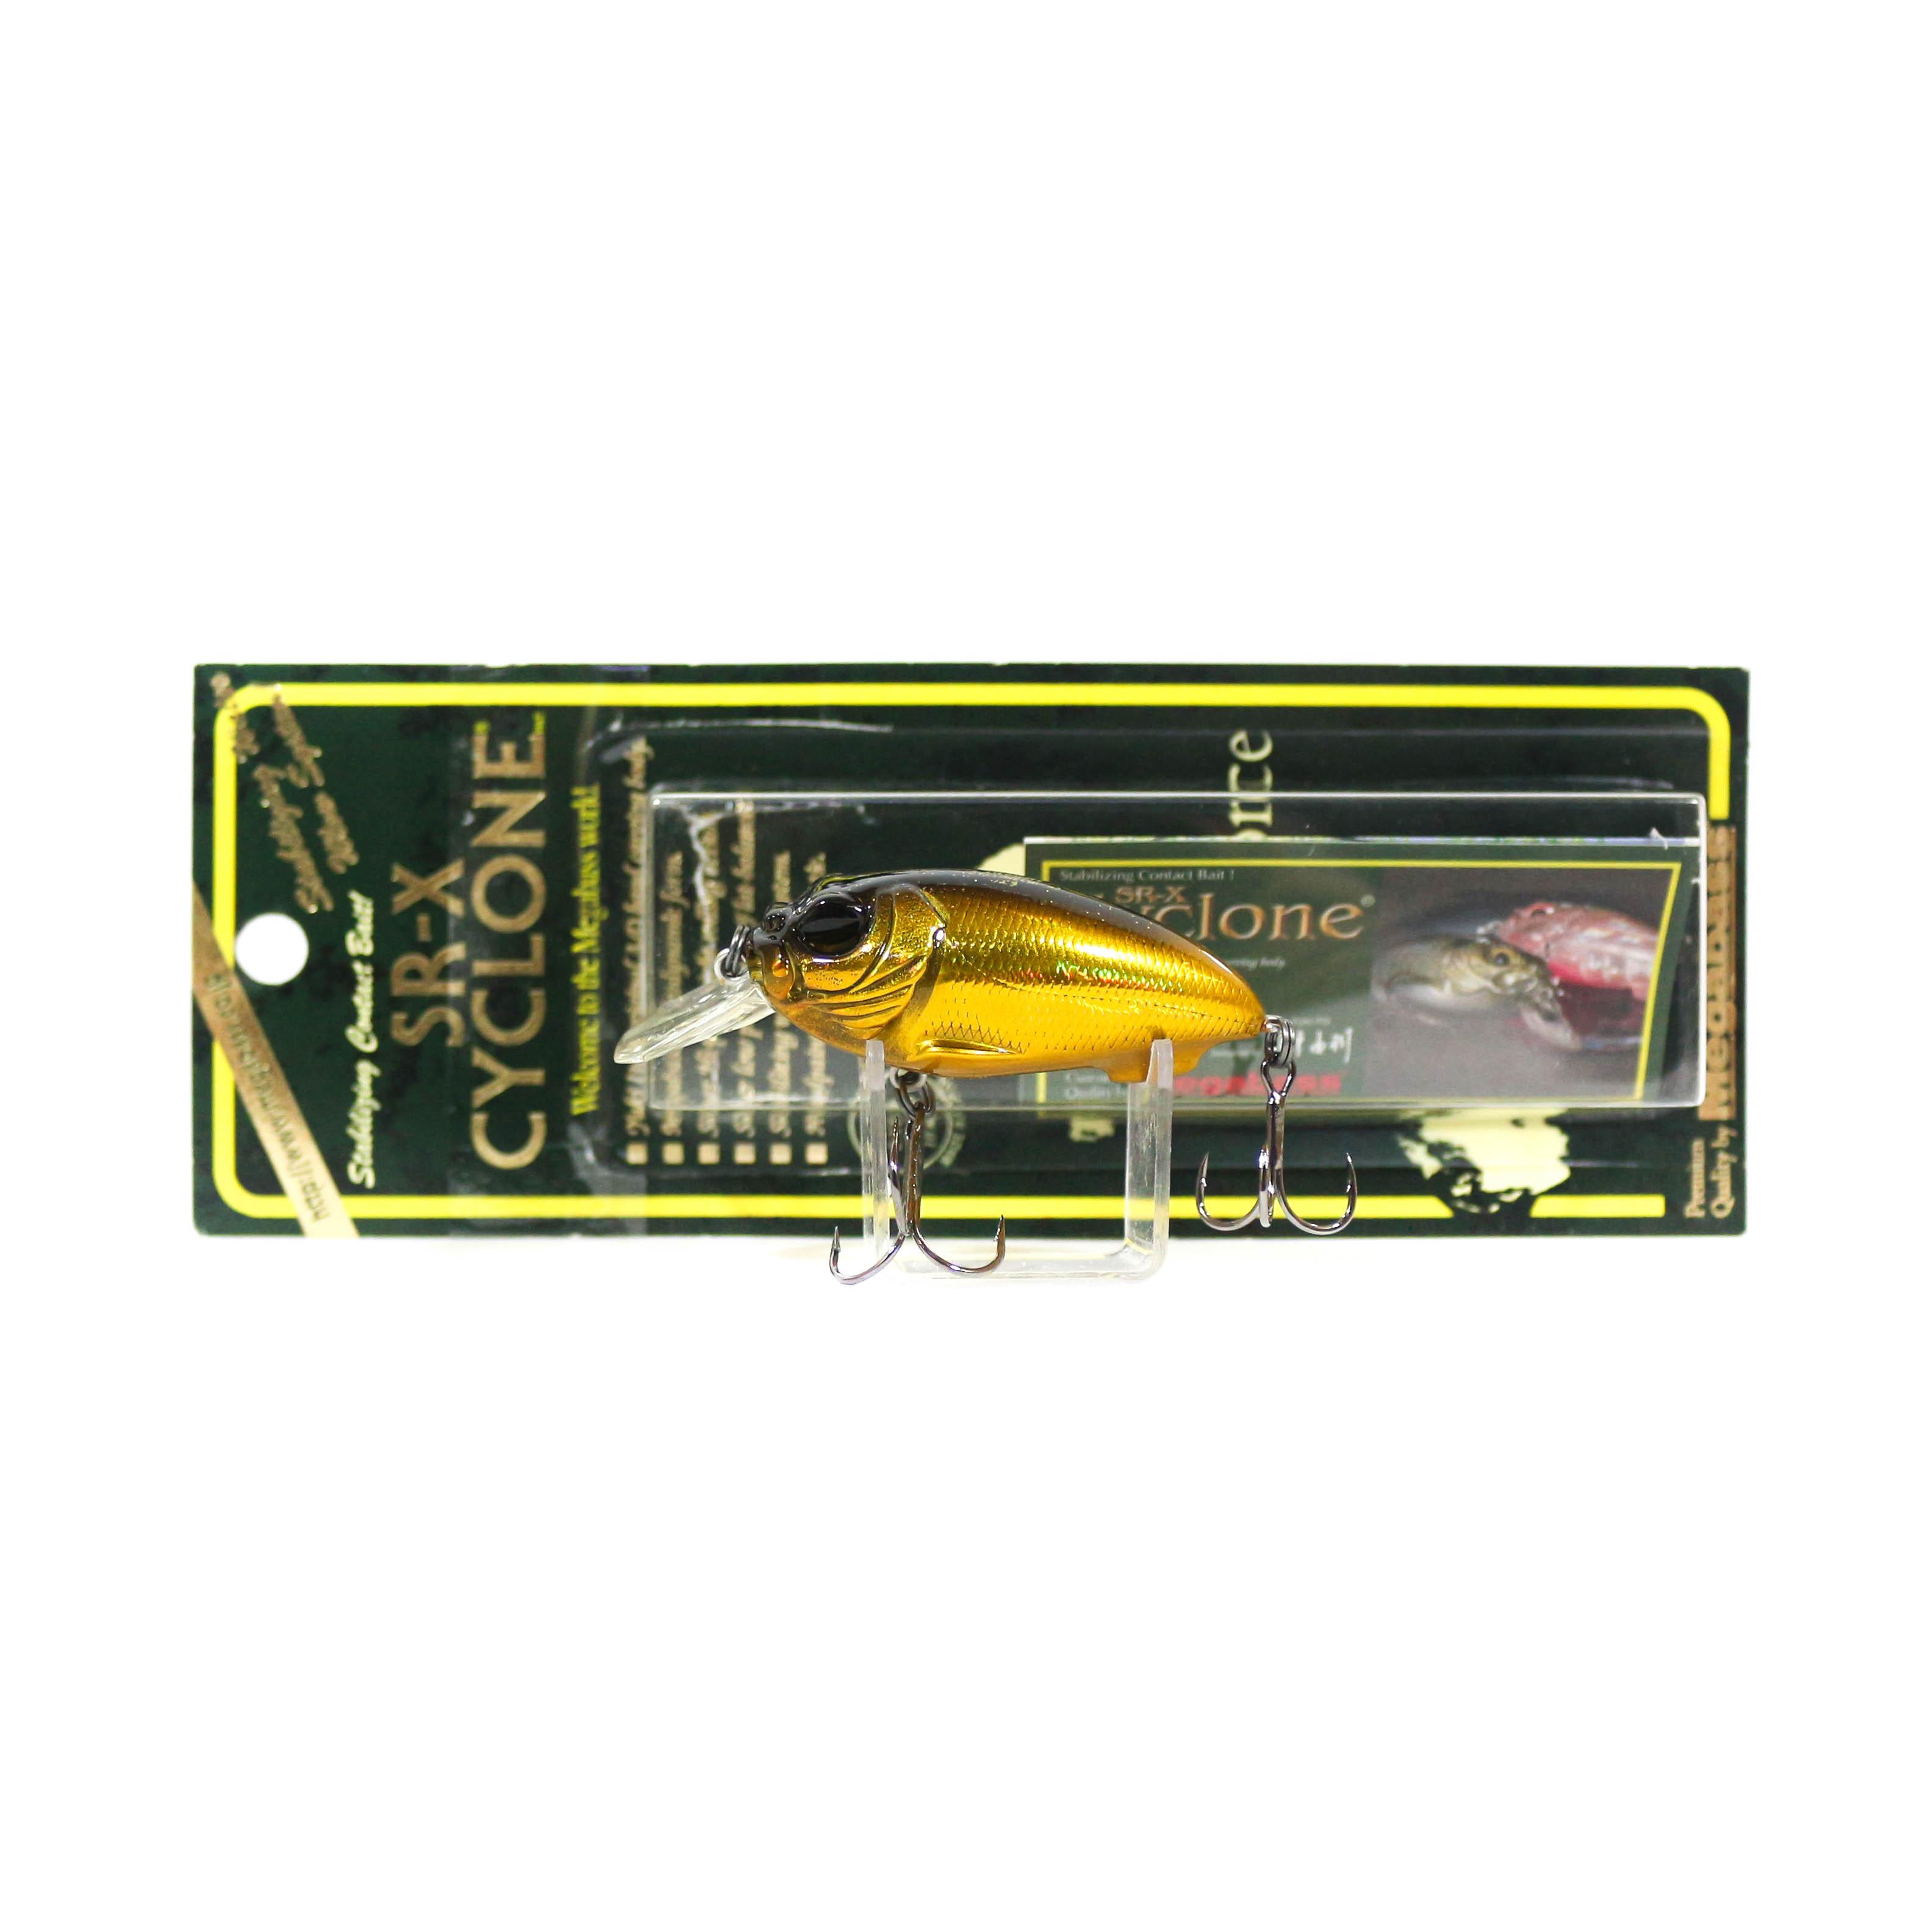 Megabass Cyclone SRX Floating Crank Bait Lure GG Alien Gold (3975)